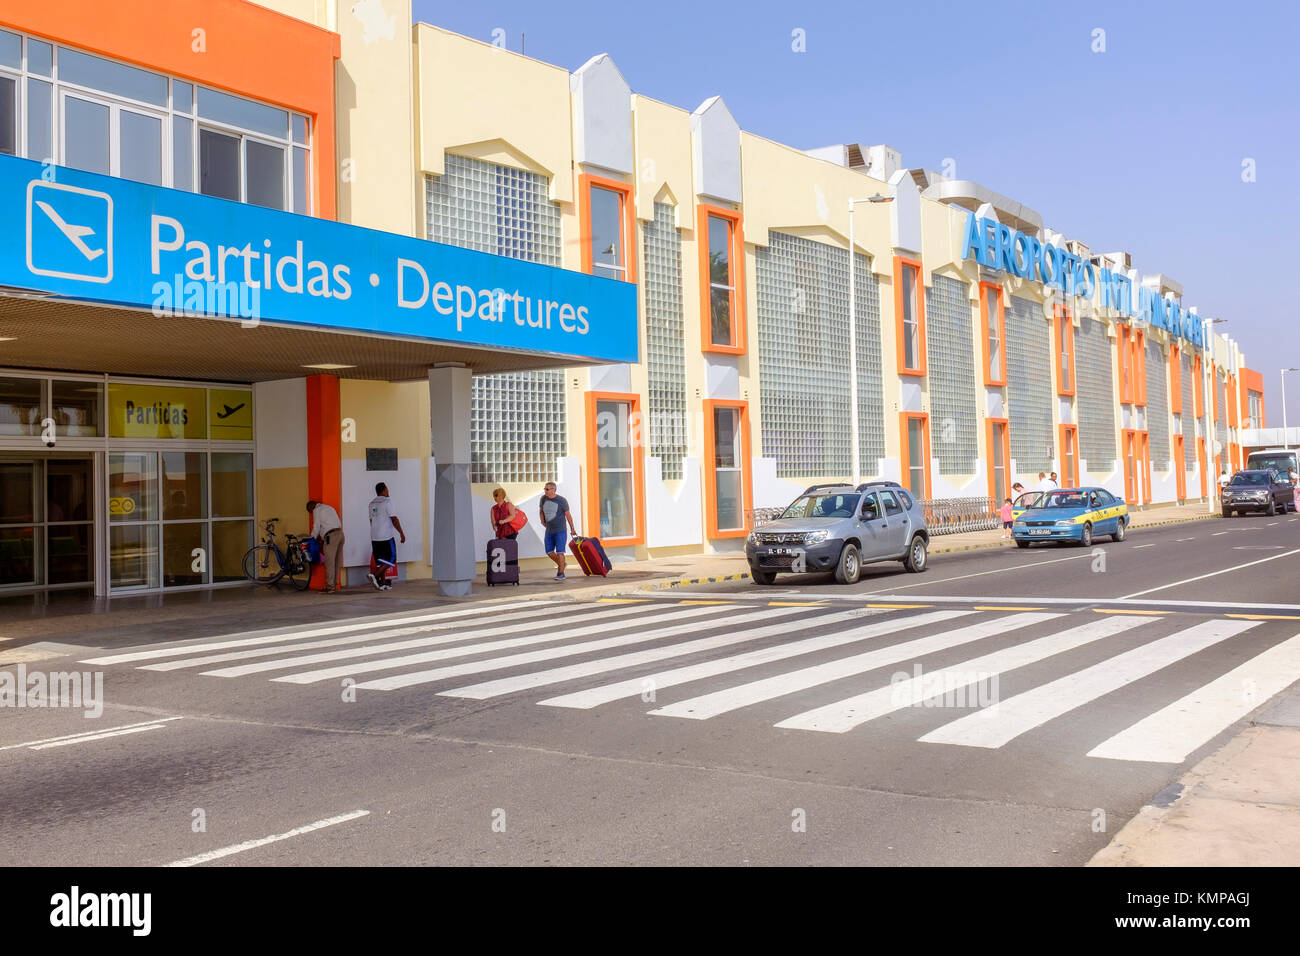 L'accès à la salle d'embarquement à l'Aéroport International Amilcar Cabral, Cap Photo Stock